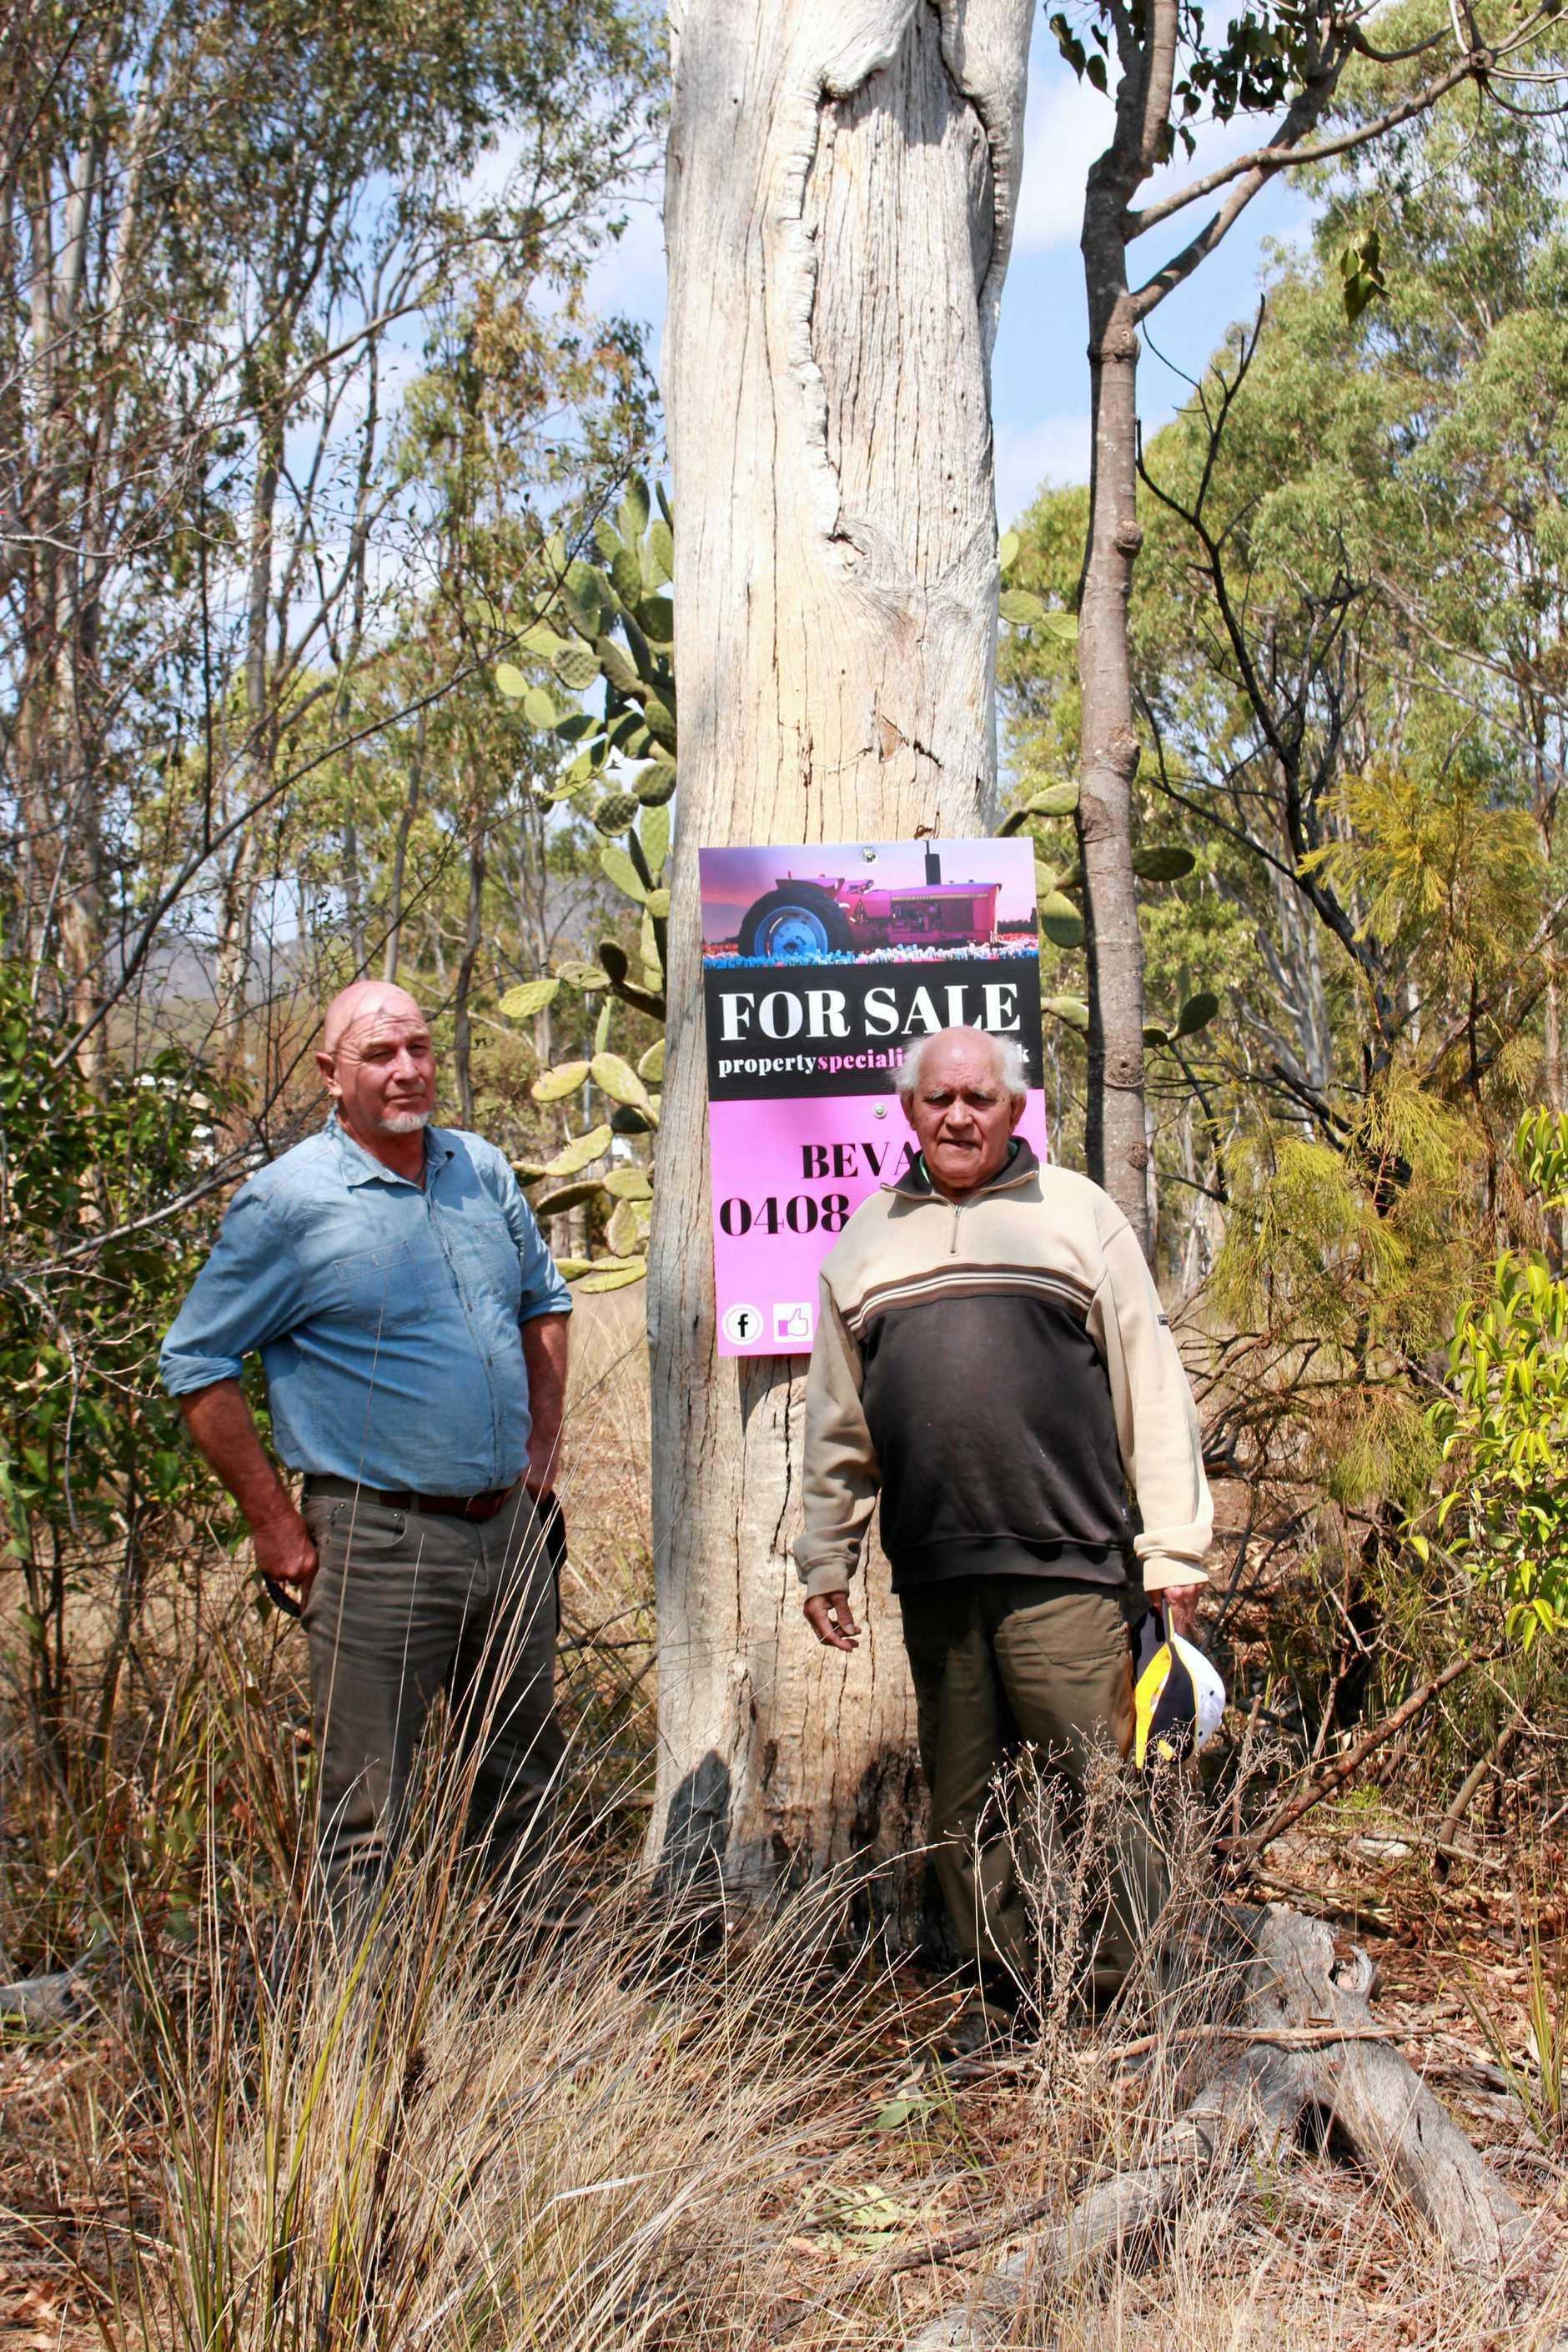 Githabul elder Sam Bonner and Maryvale man David Bate inspected the site last week.